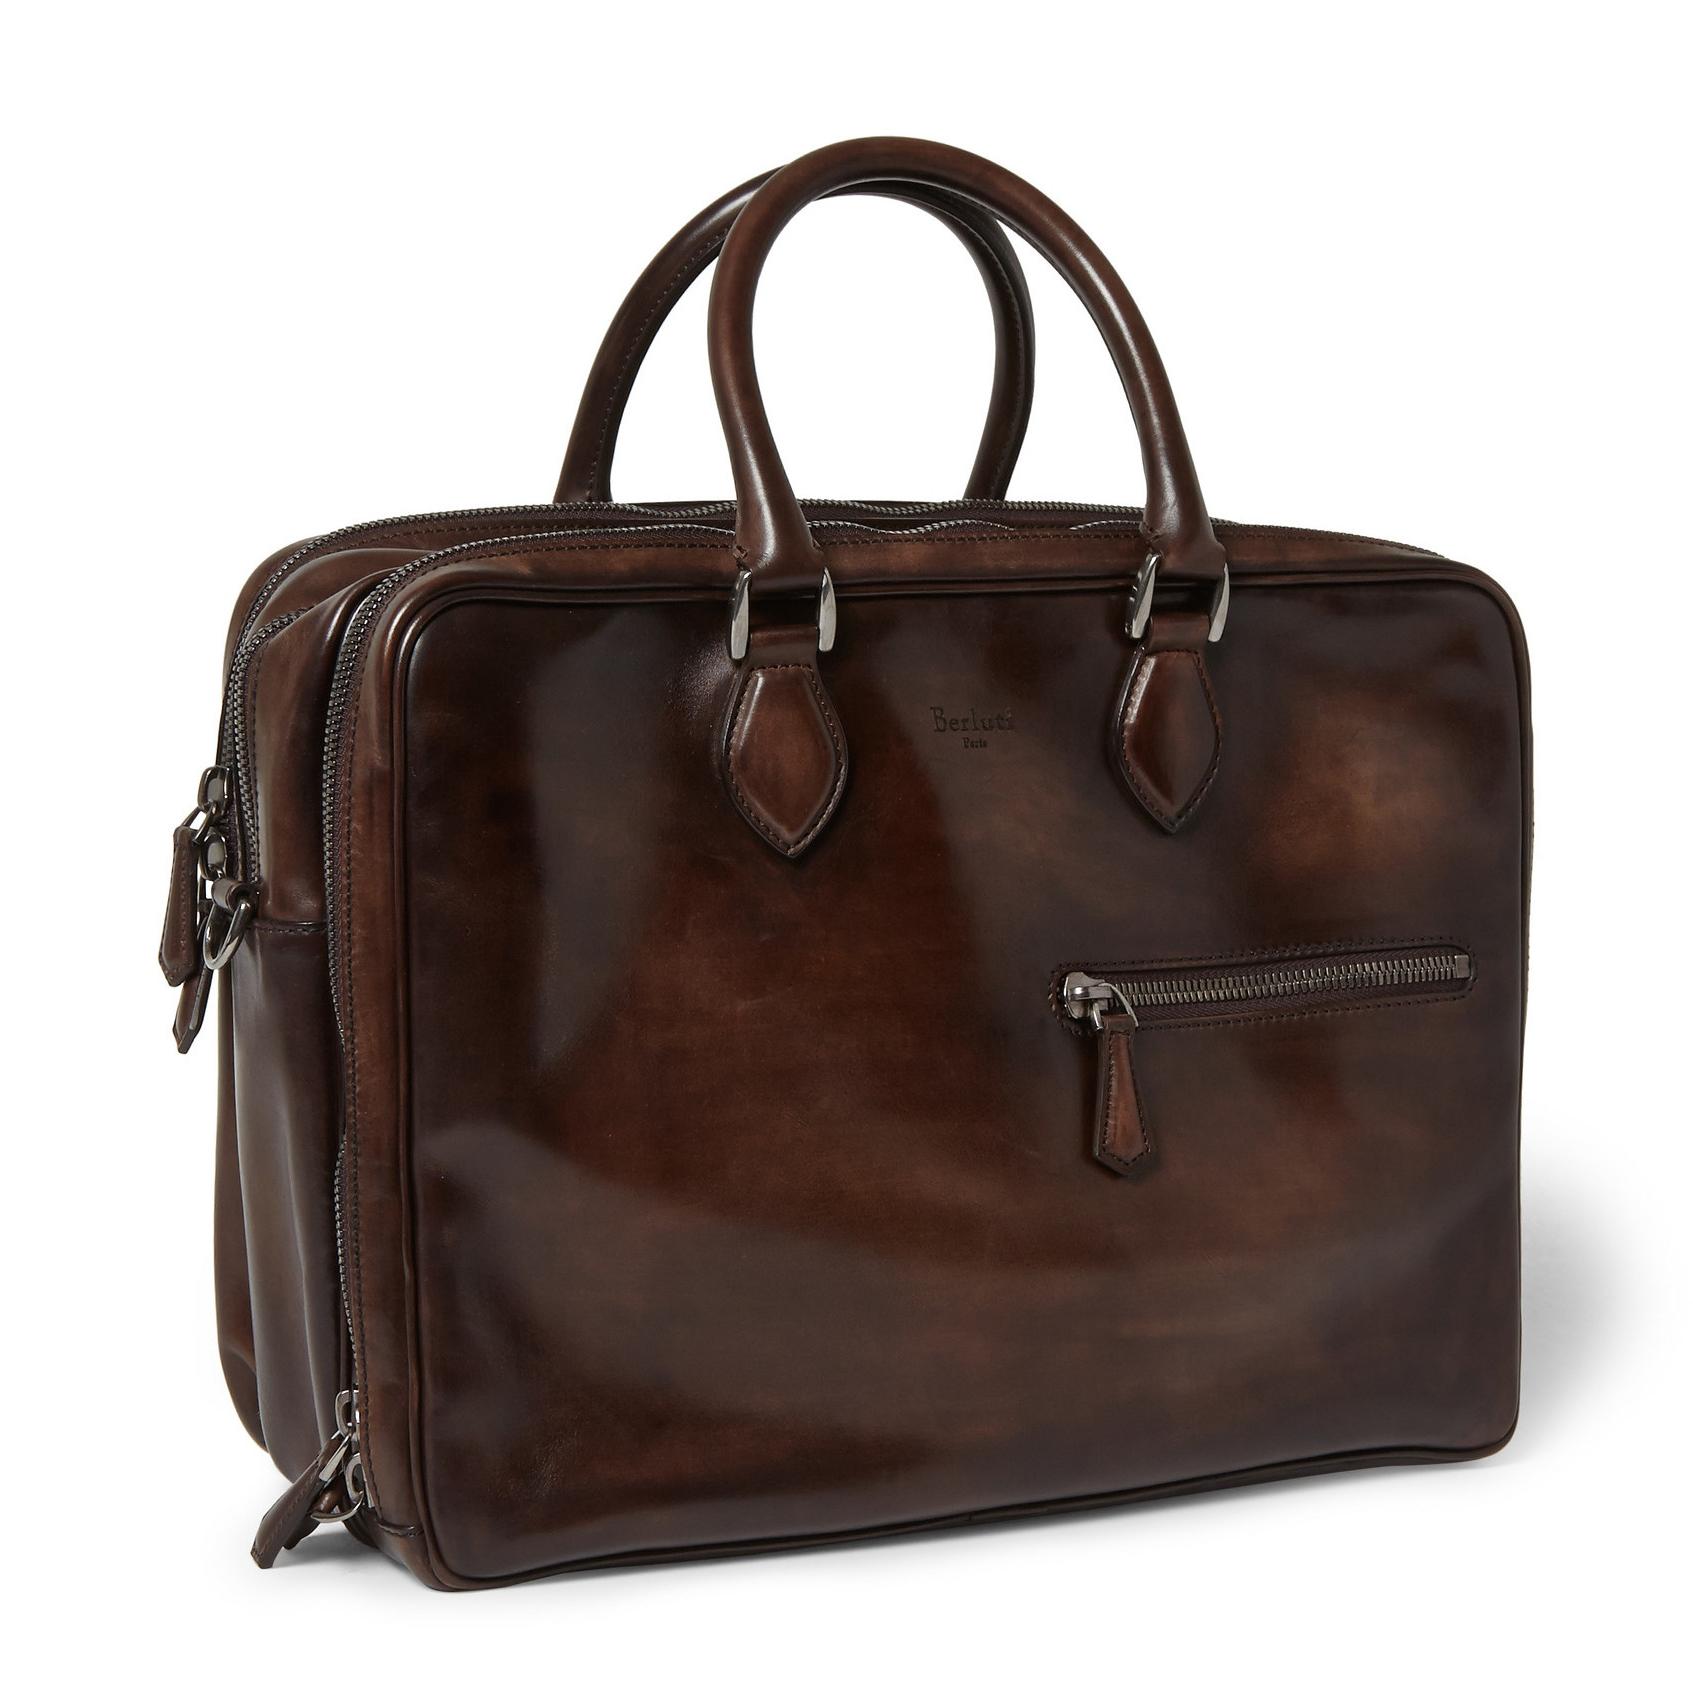 Berlutti Men's Bag